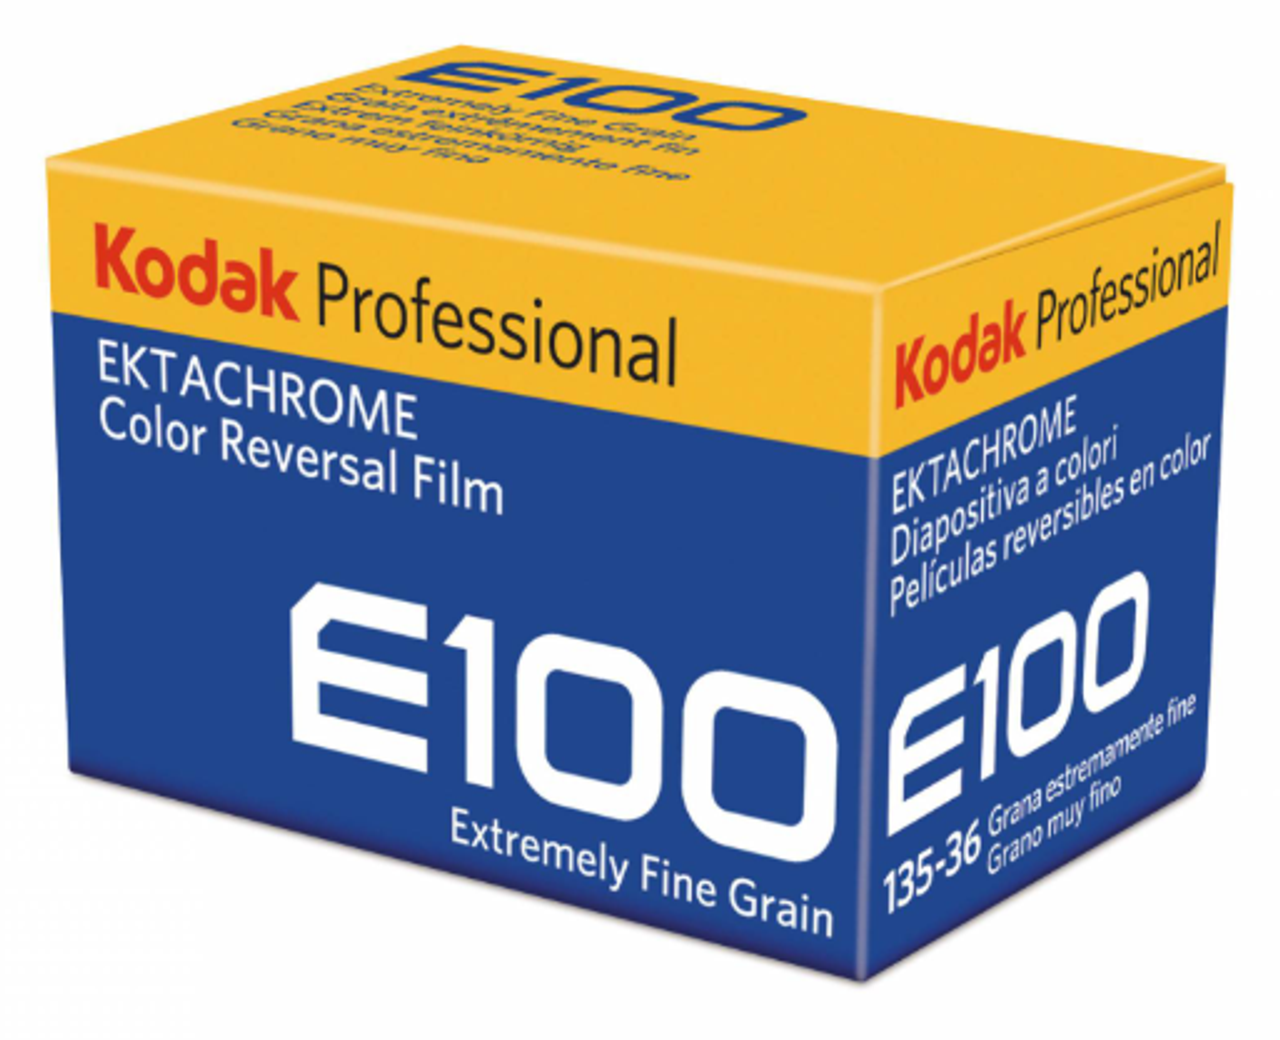 Kodak Ektachrome E100 35mm film (ships on 23 Oct, with free upgrade to  Express Post!)